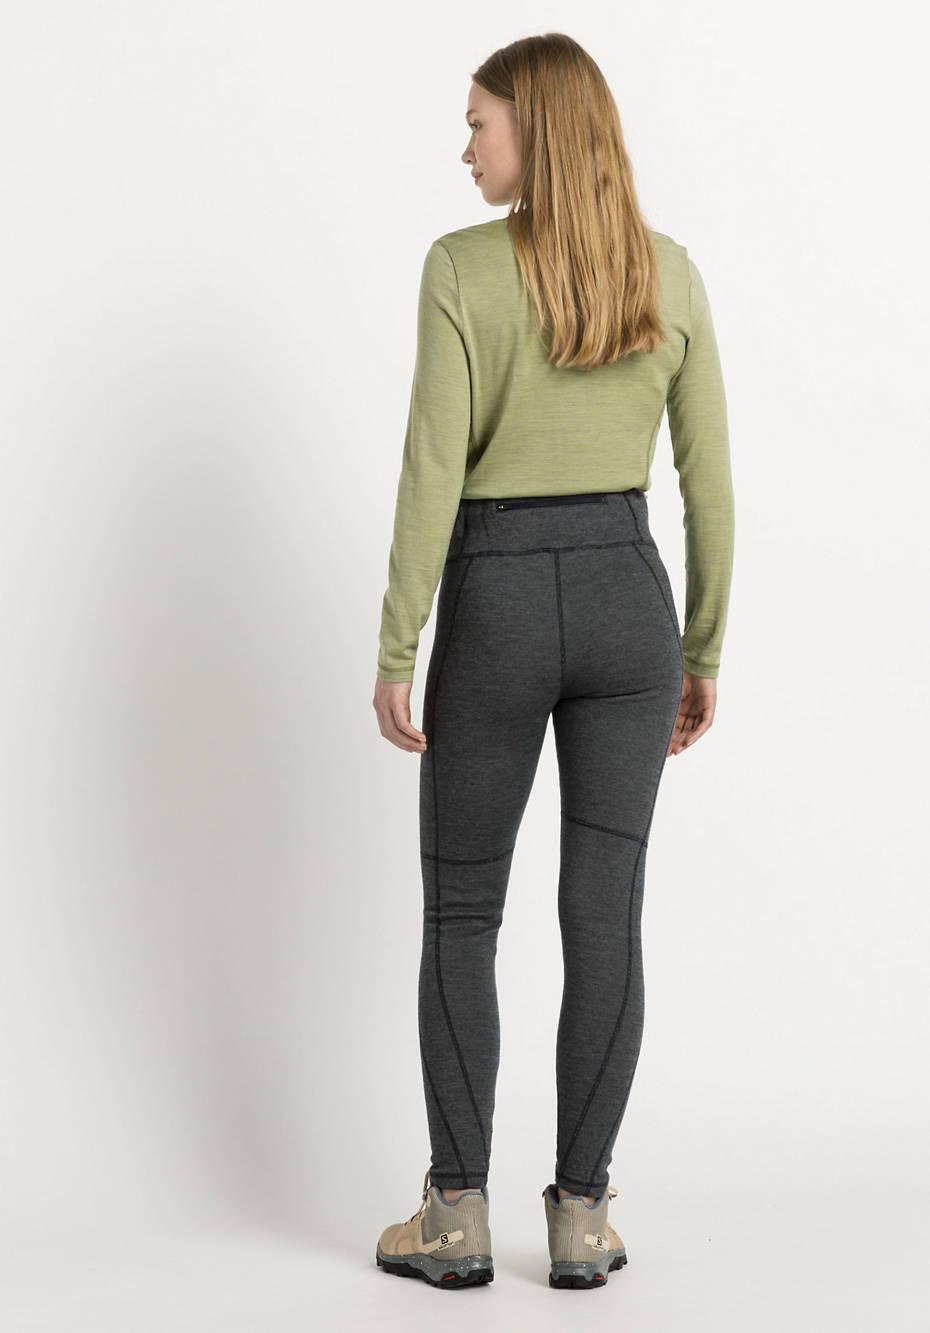 Functional leggings made of organic merino wool with organic cotton